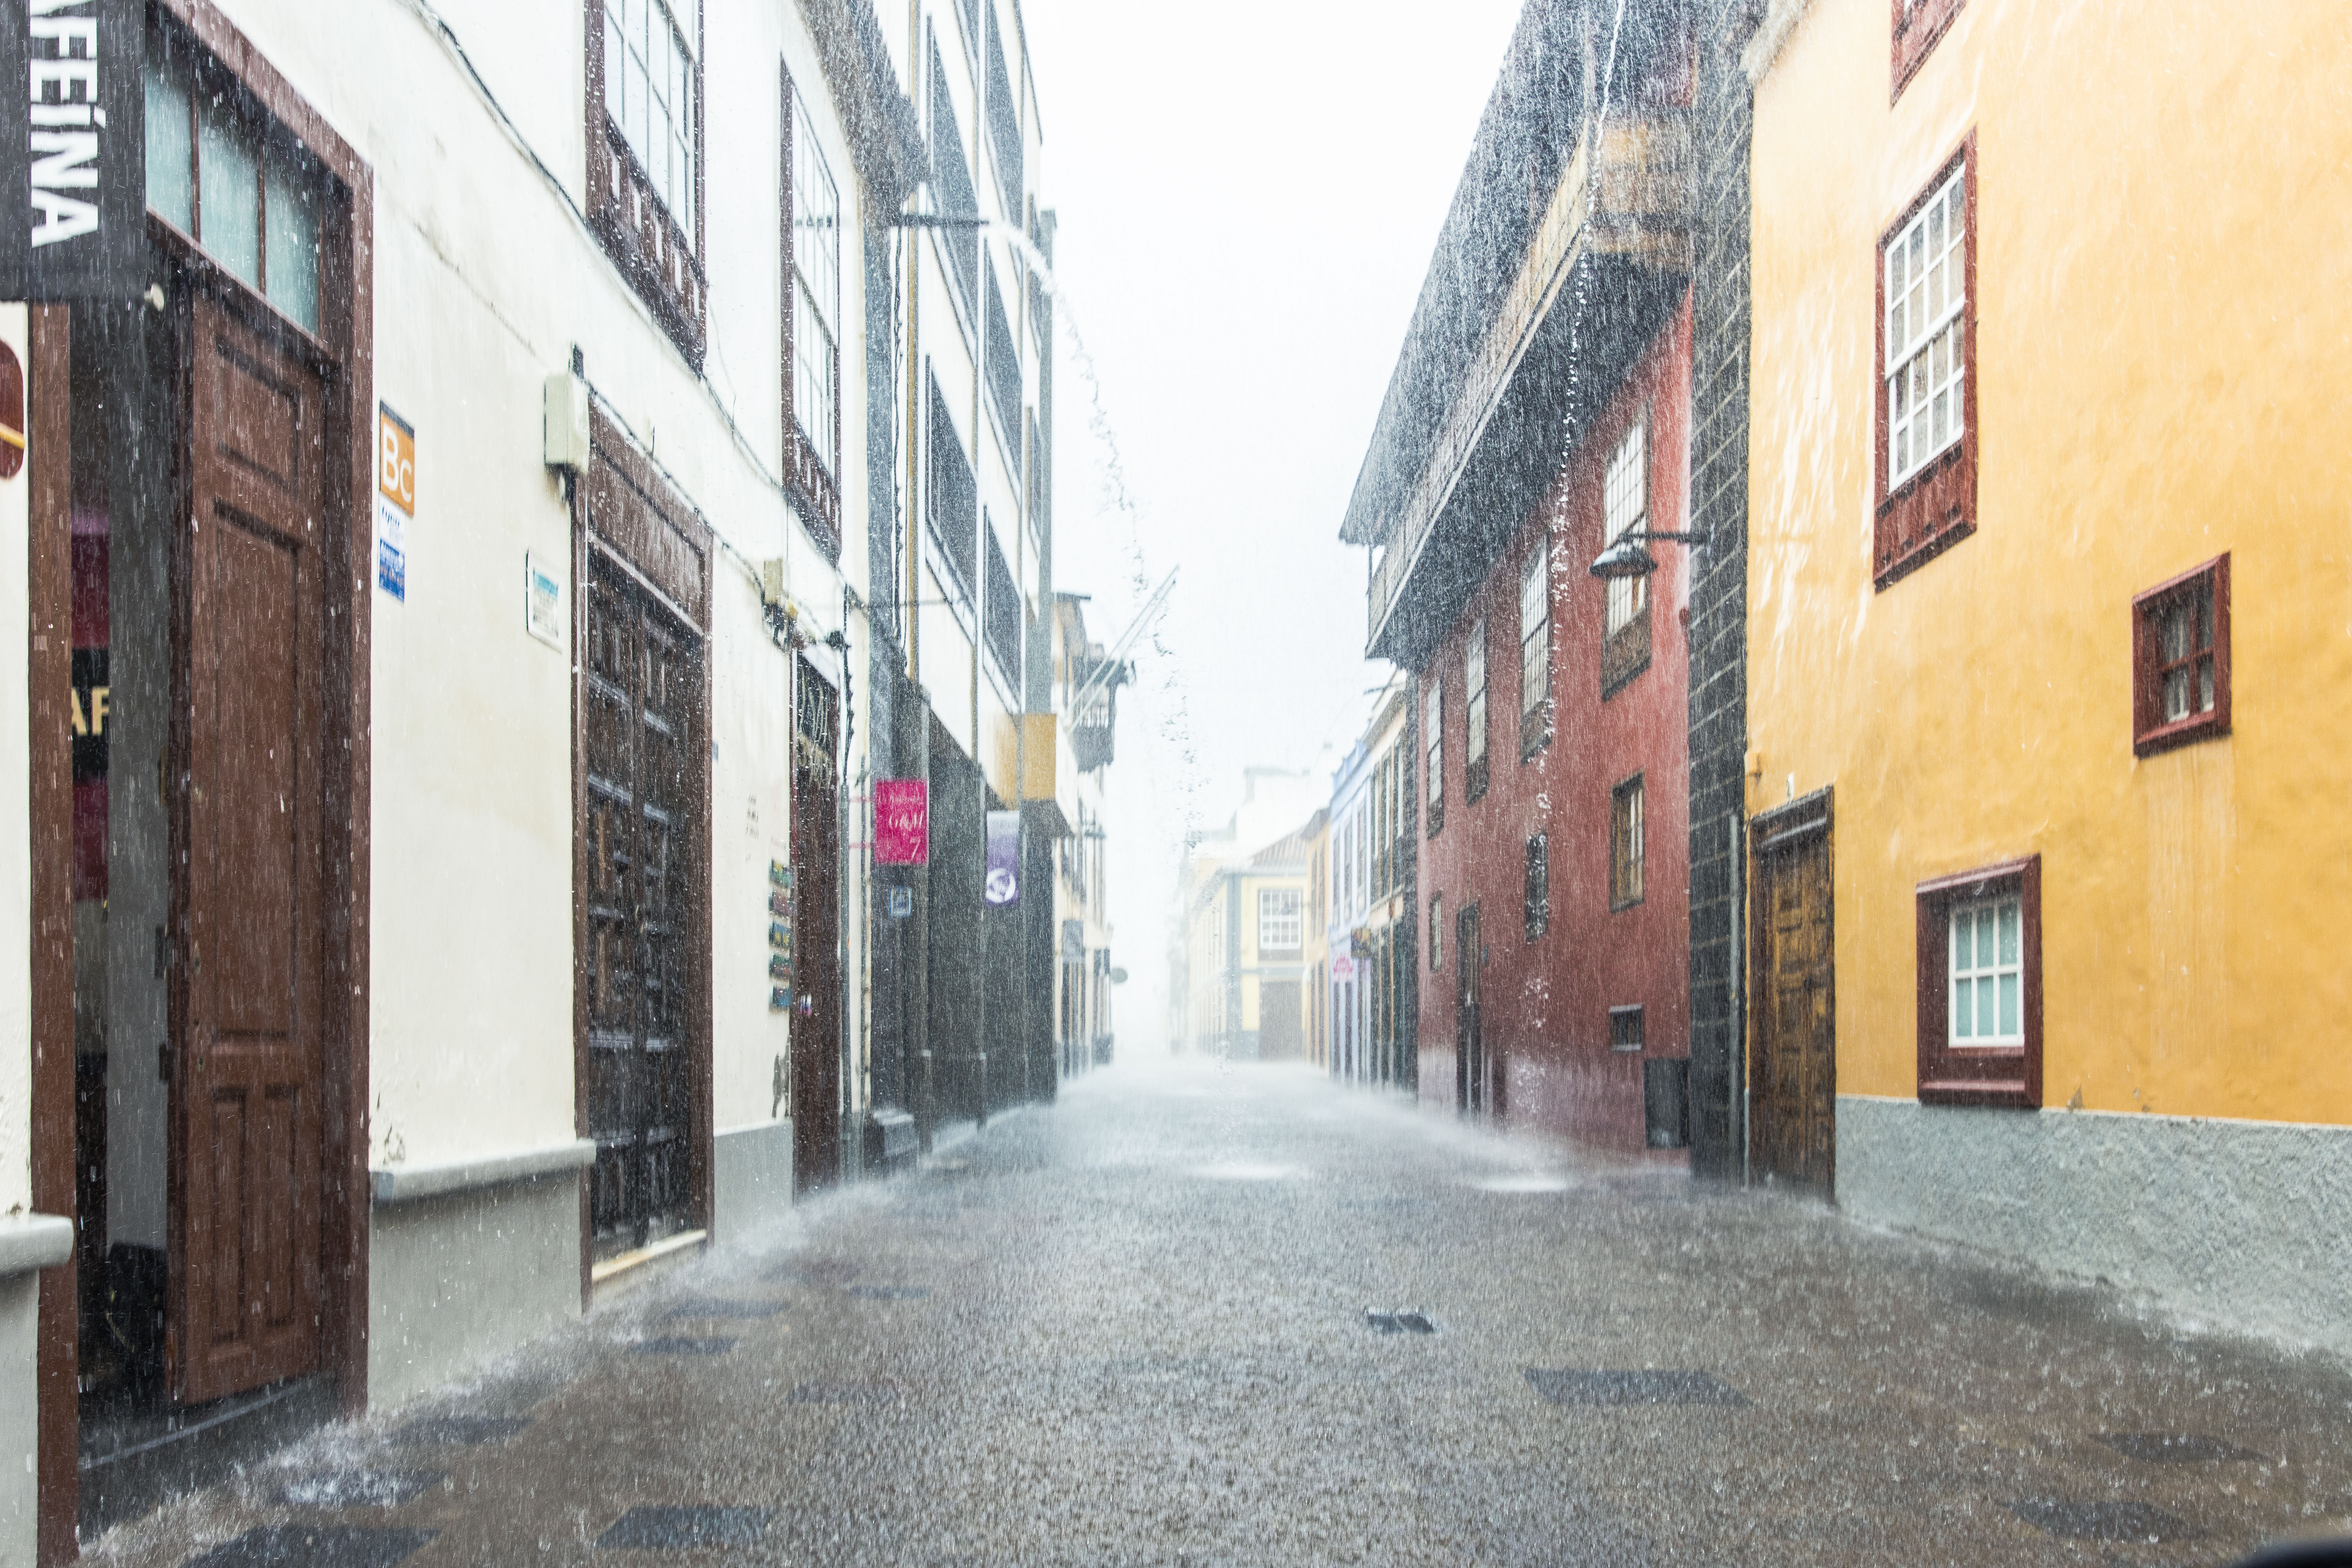 Lluvia tropical